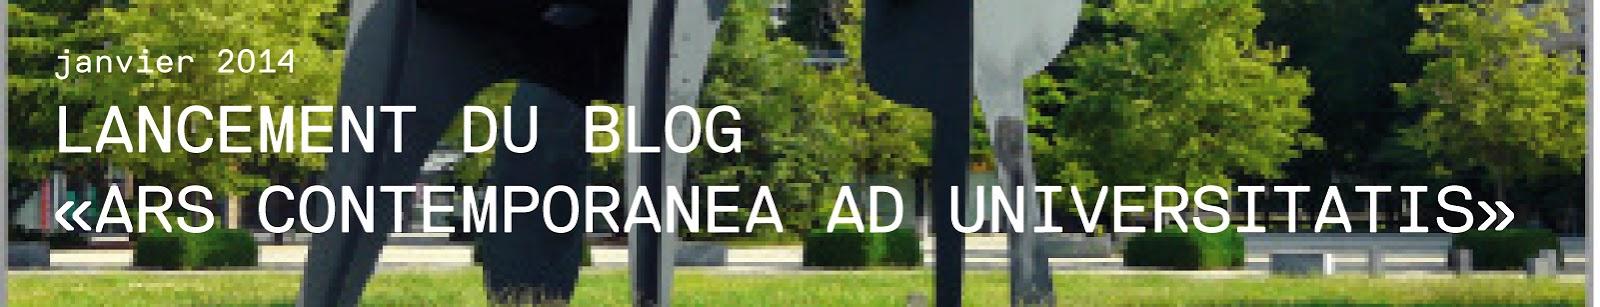 http://art-ecoles-universites.blogspot.fr/